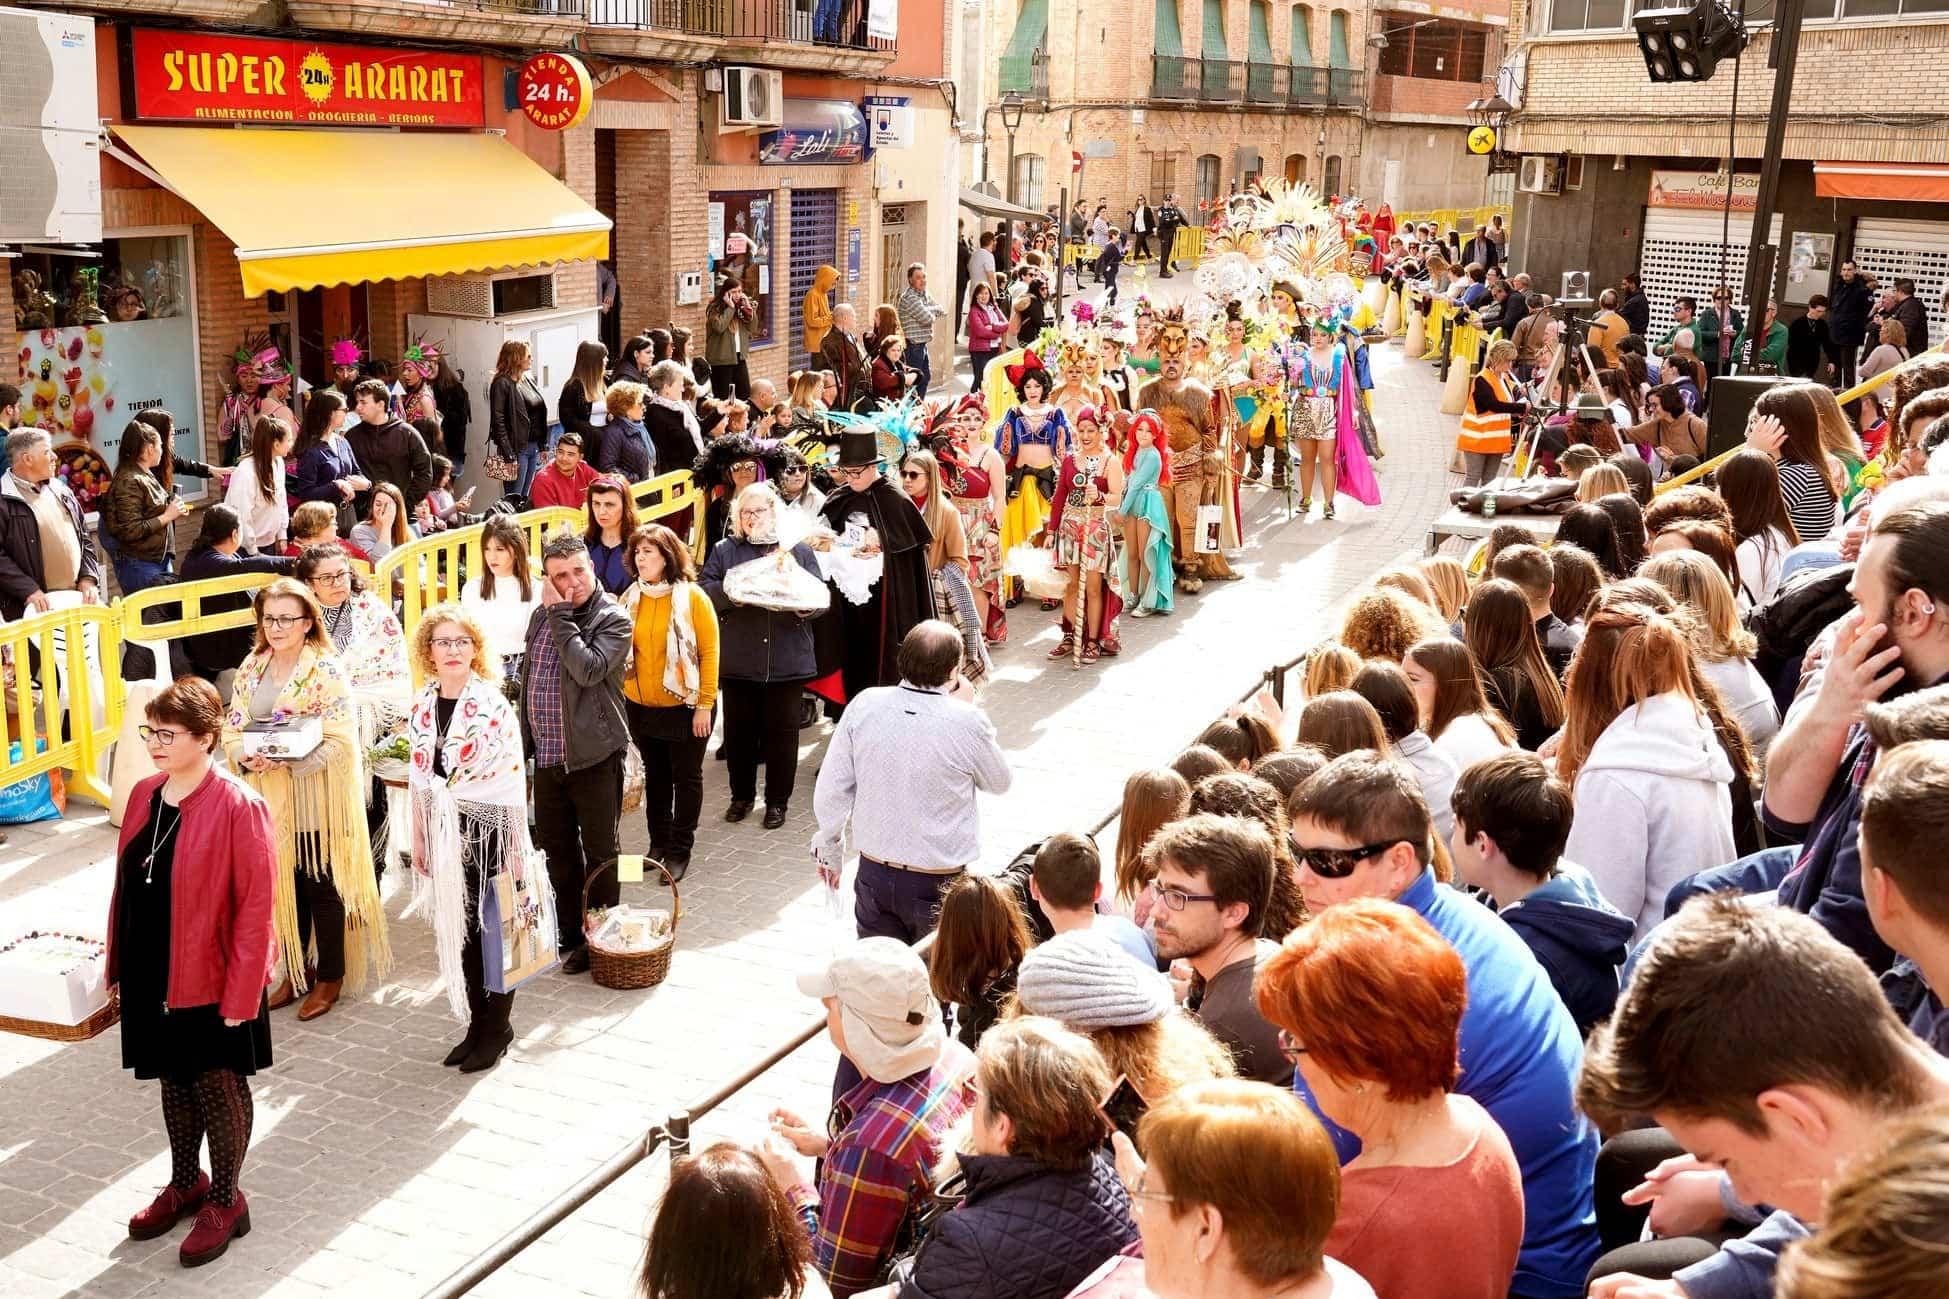 Carnaval de herencia 2020 ofertorio 112 - Selección de fotografías del Ofertorio del Carnaval de Herencia